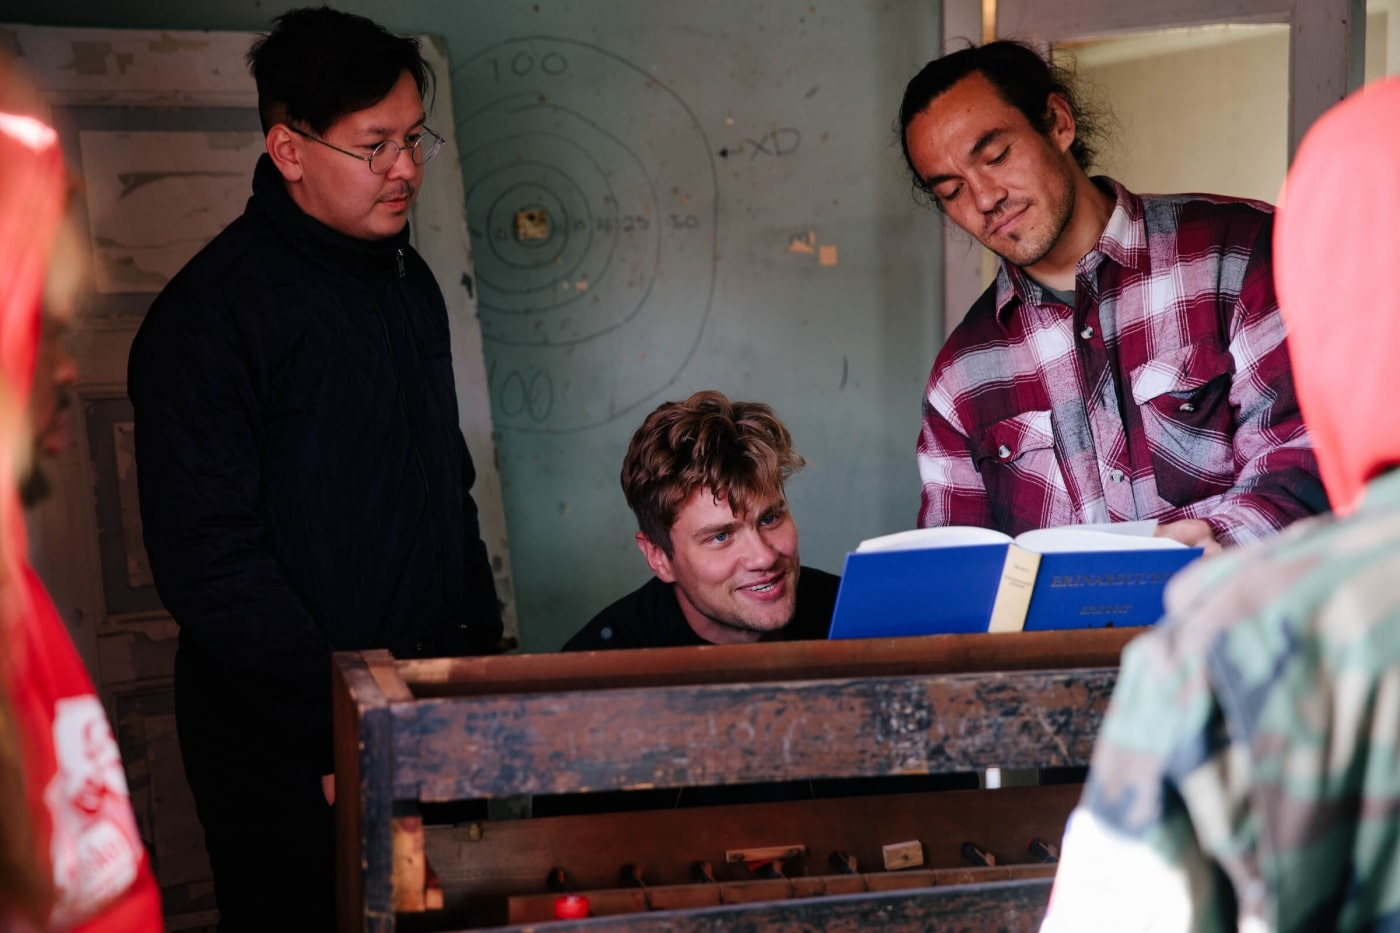 Hans-Henrik Suersaq Poulsen together with Bjarni Frímann and Miké Thomsen in the Post House. Photo by Jessie Brinkman Evans - Visit Greenland